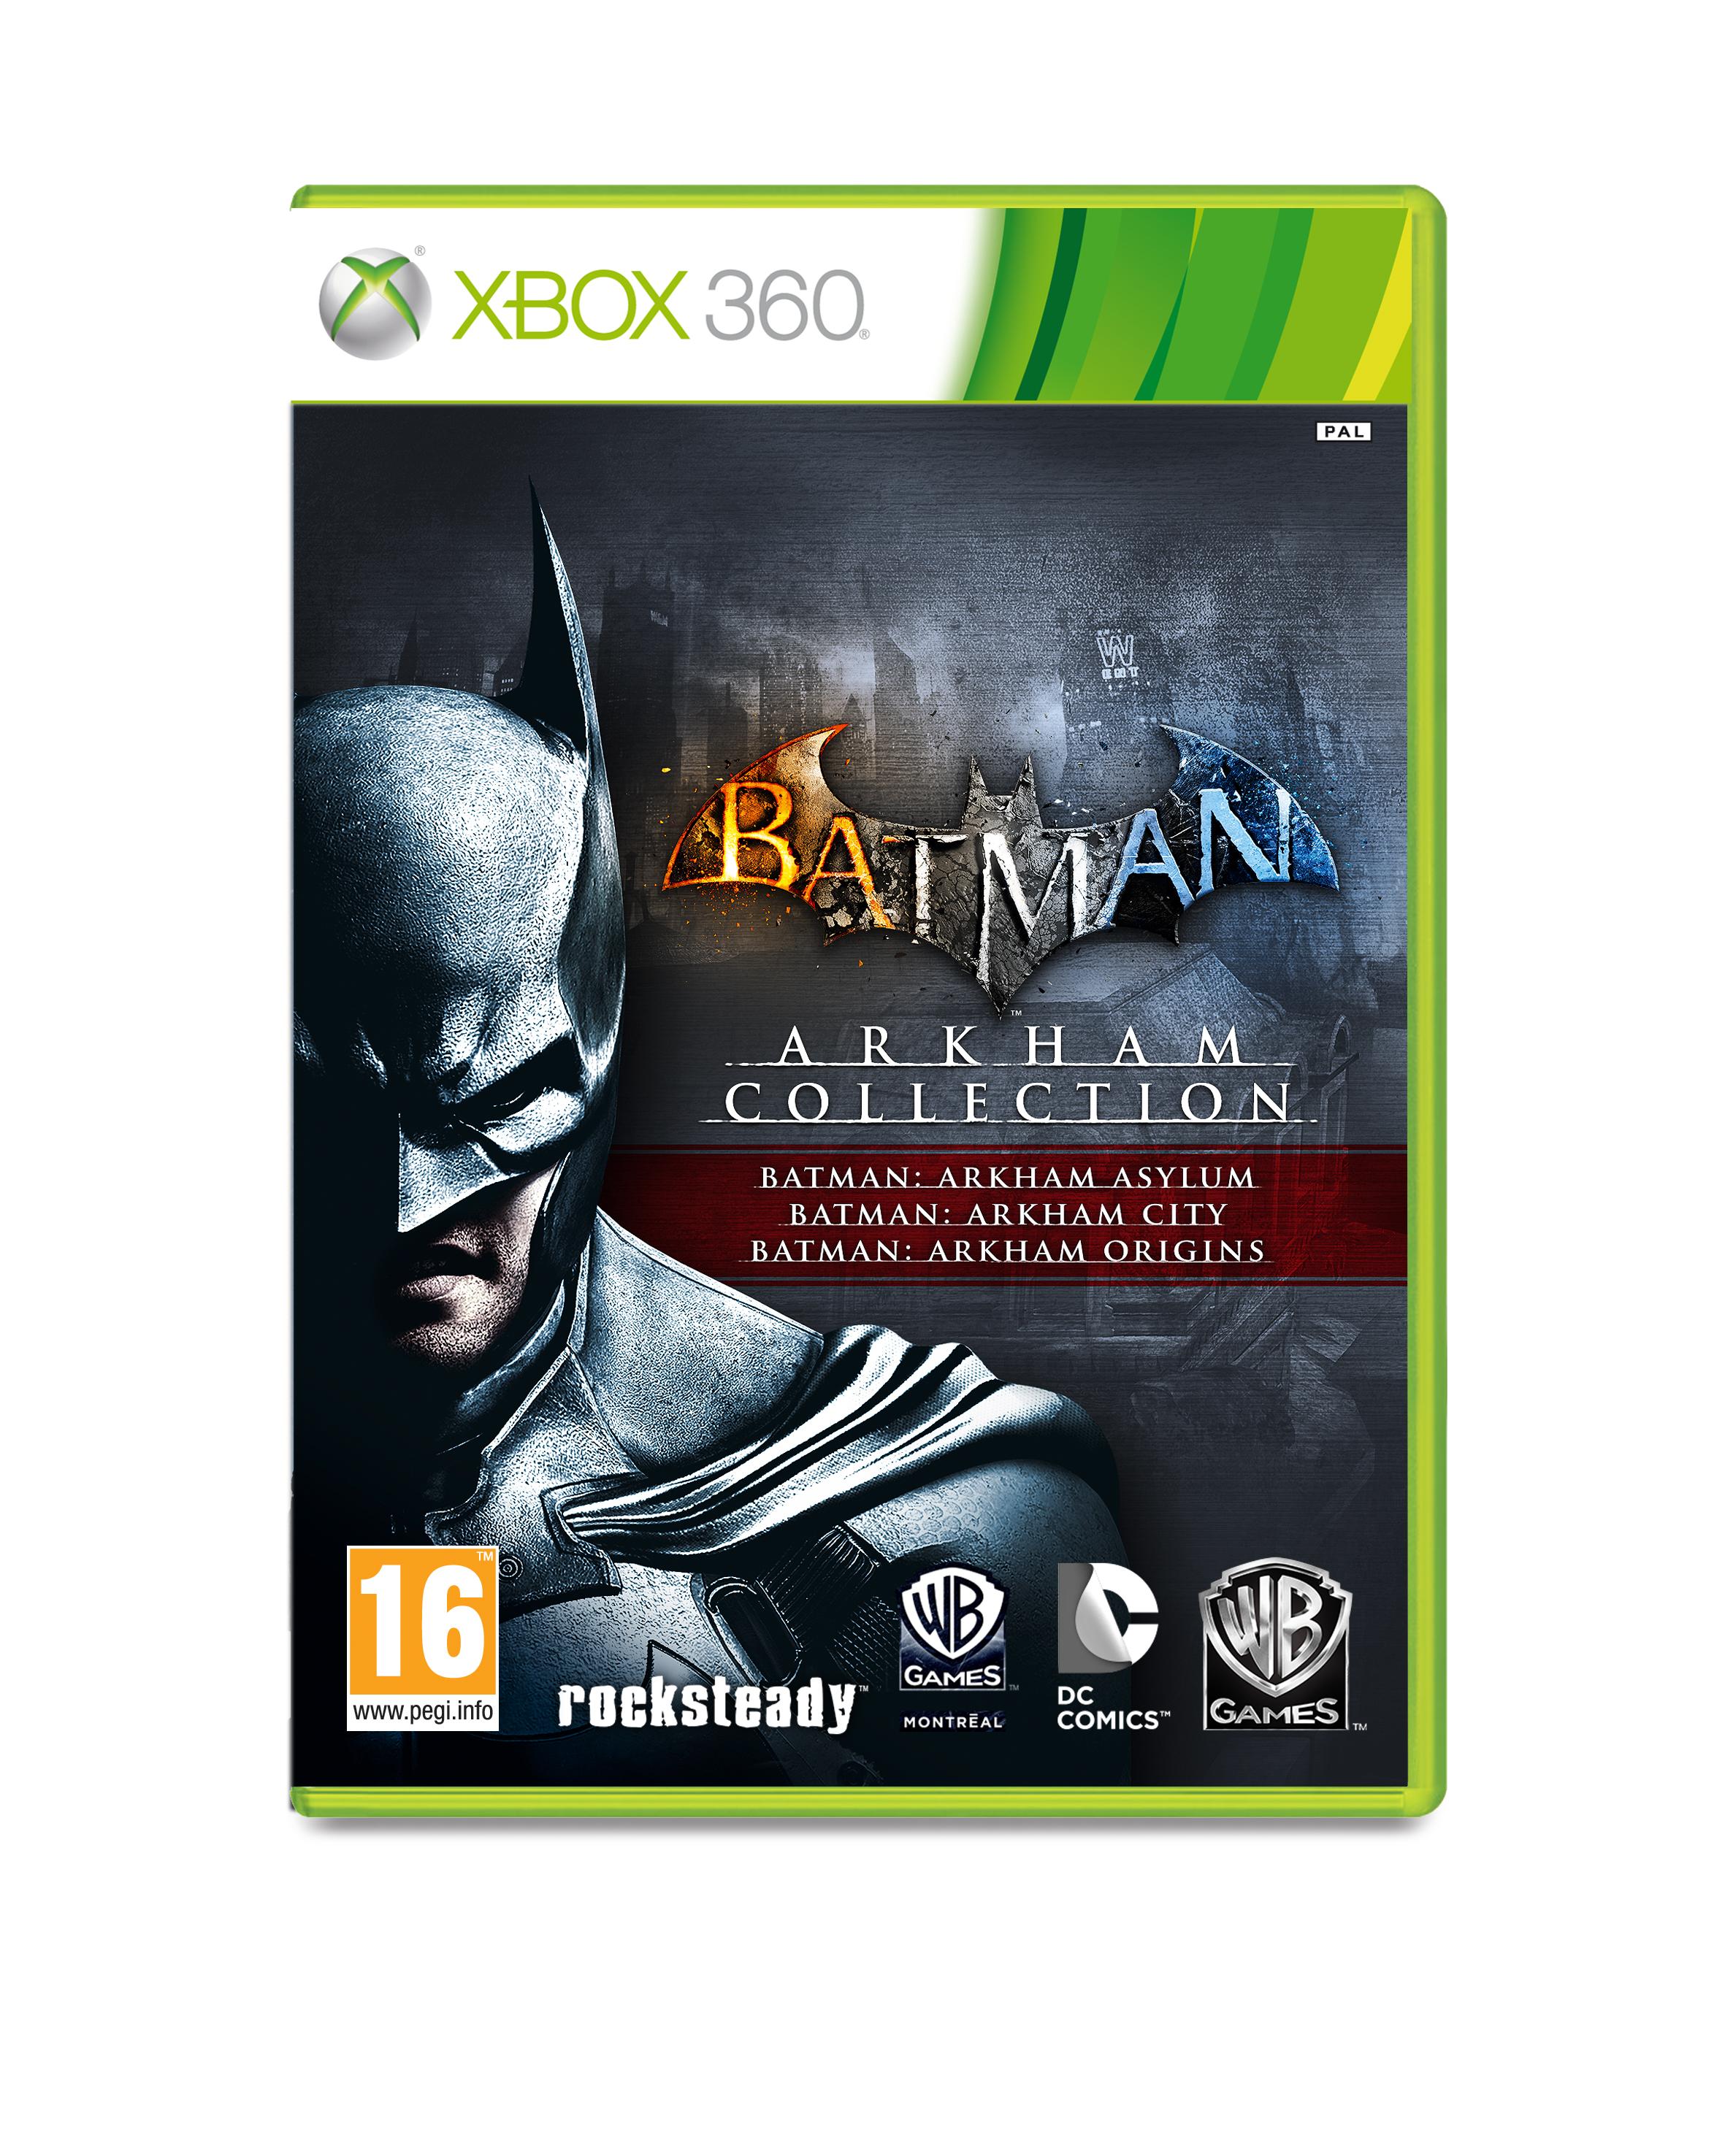 Batman Arkham City Playthrough (Part 1) - Xbox 360 - Game ...